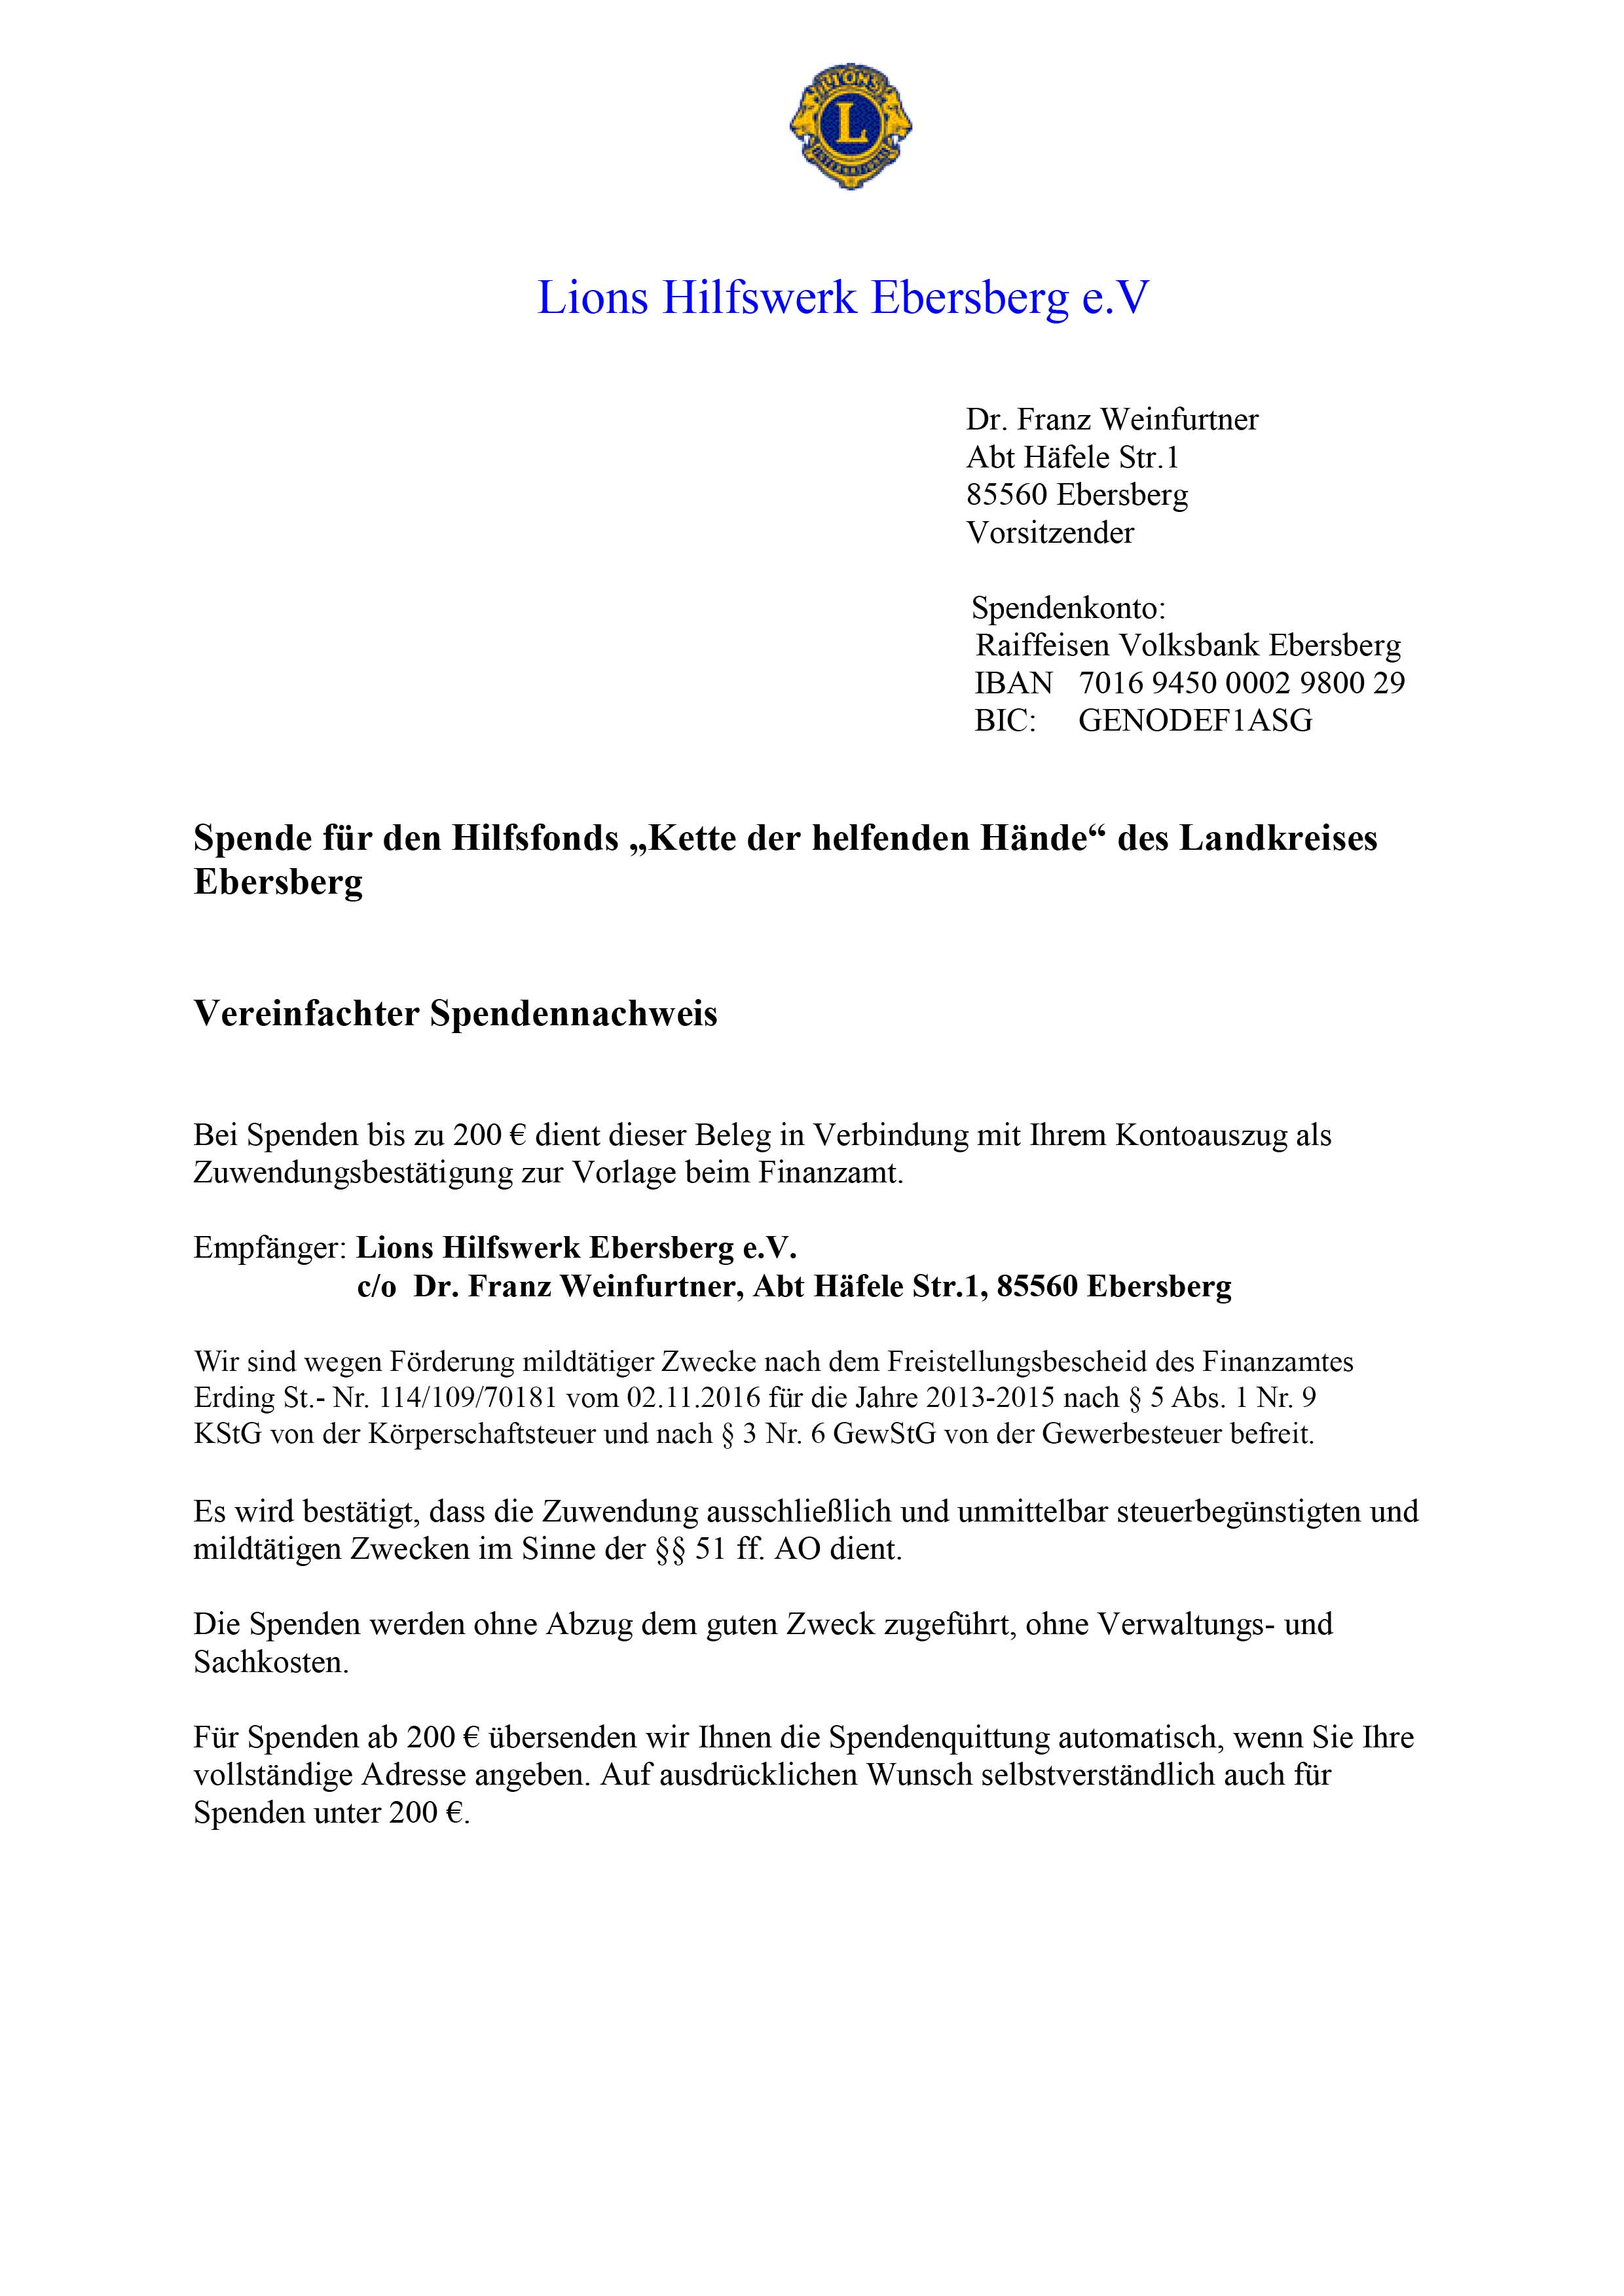 Lions Club Ebersberg - Spendenbescheinigung